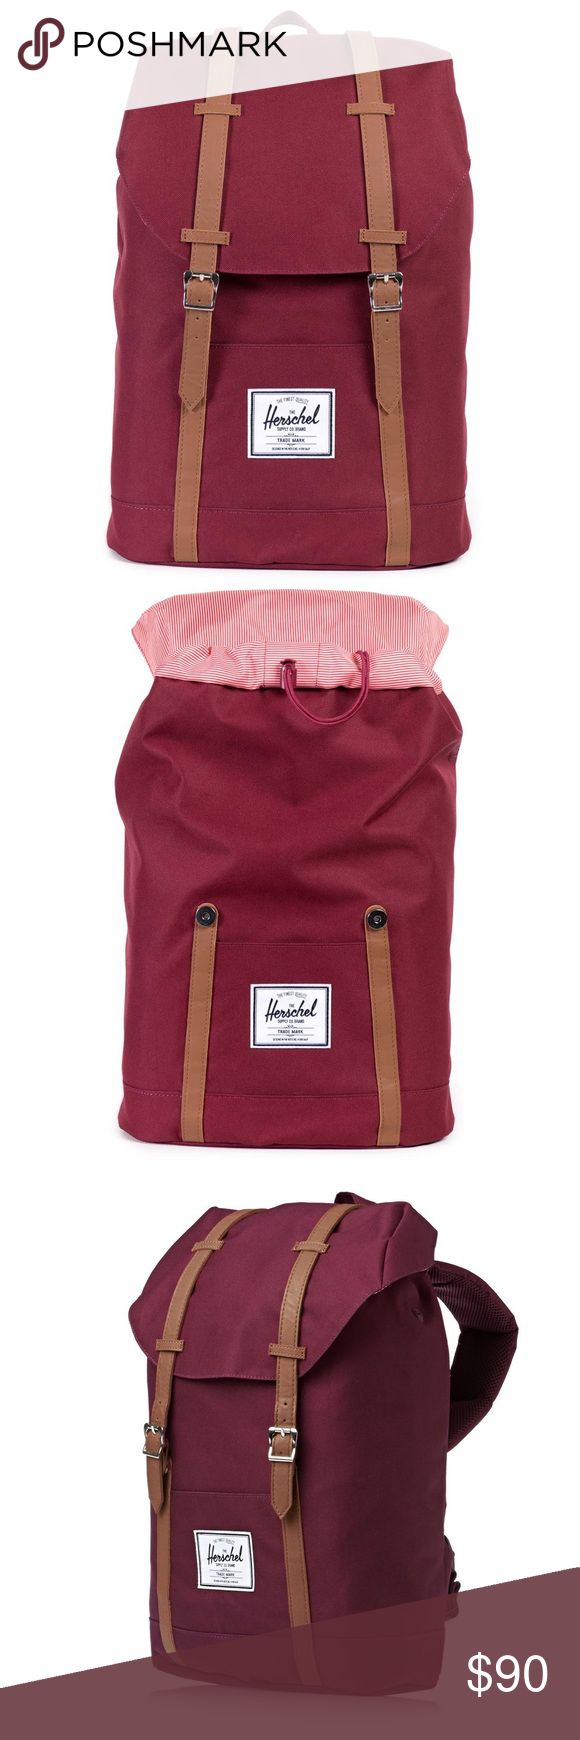 f69f0b4e55 NWT HERSCHEL RETREAT BACKPACK WINDSOR WINE The Herschel Retreat™ backpack  is a streamlined rendition of